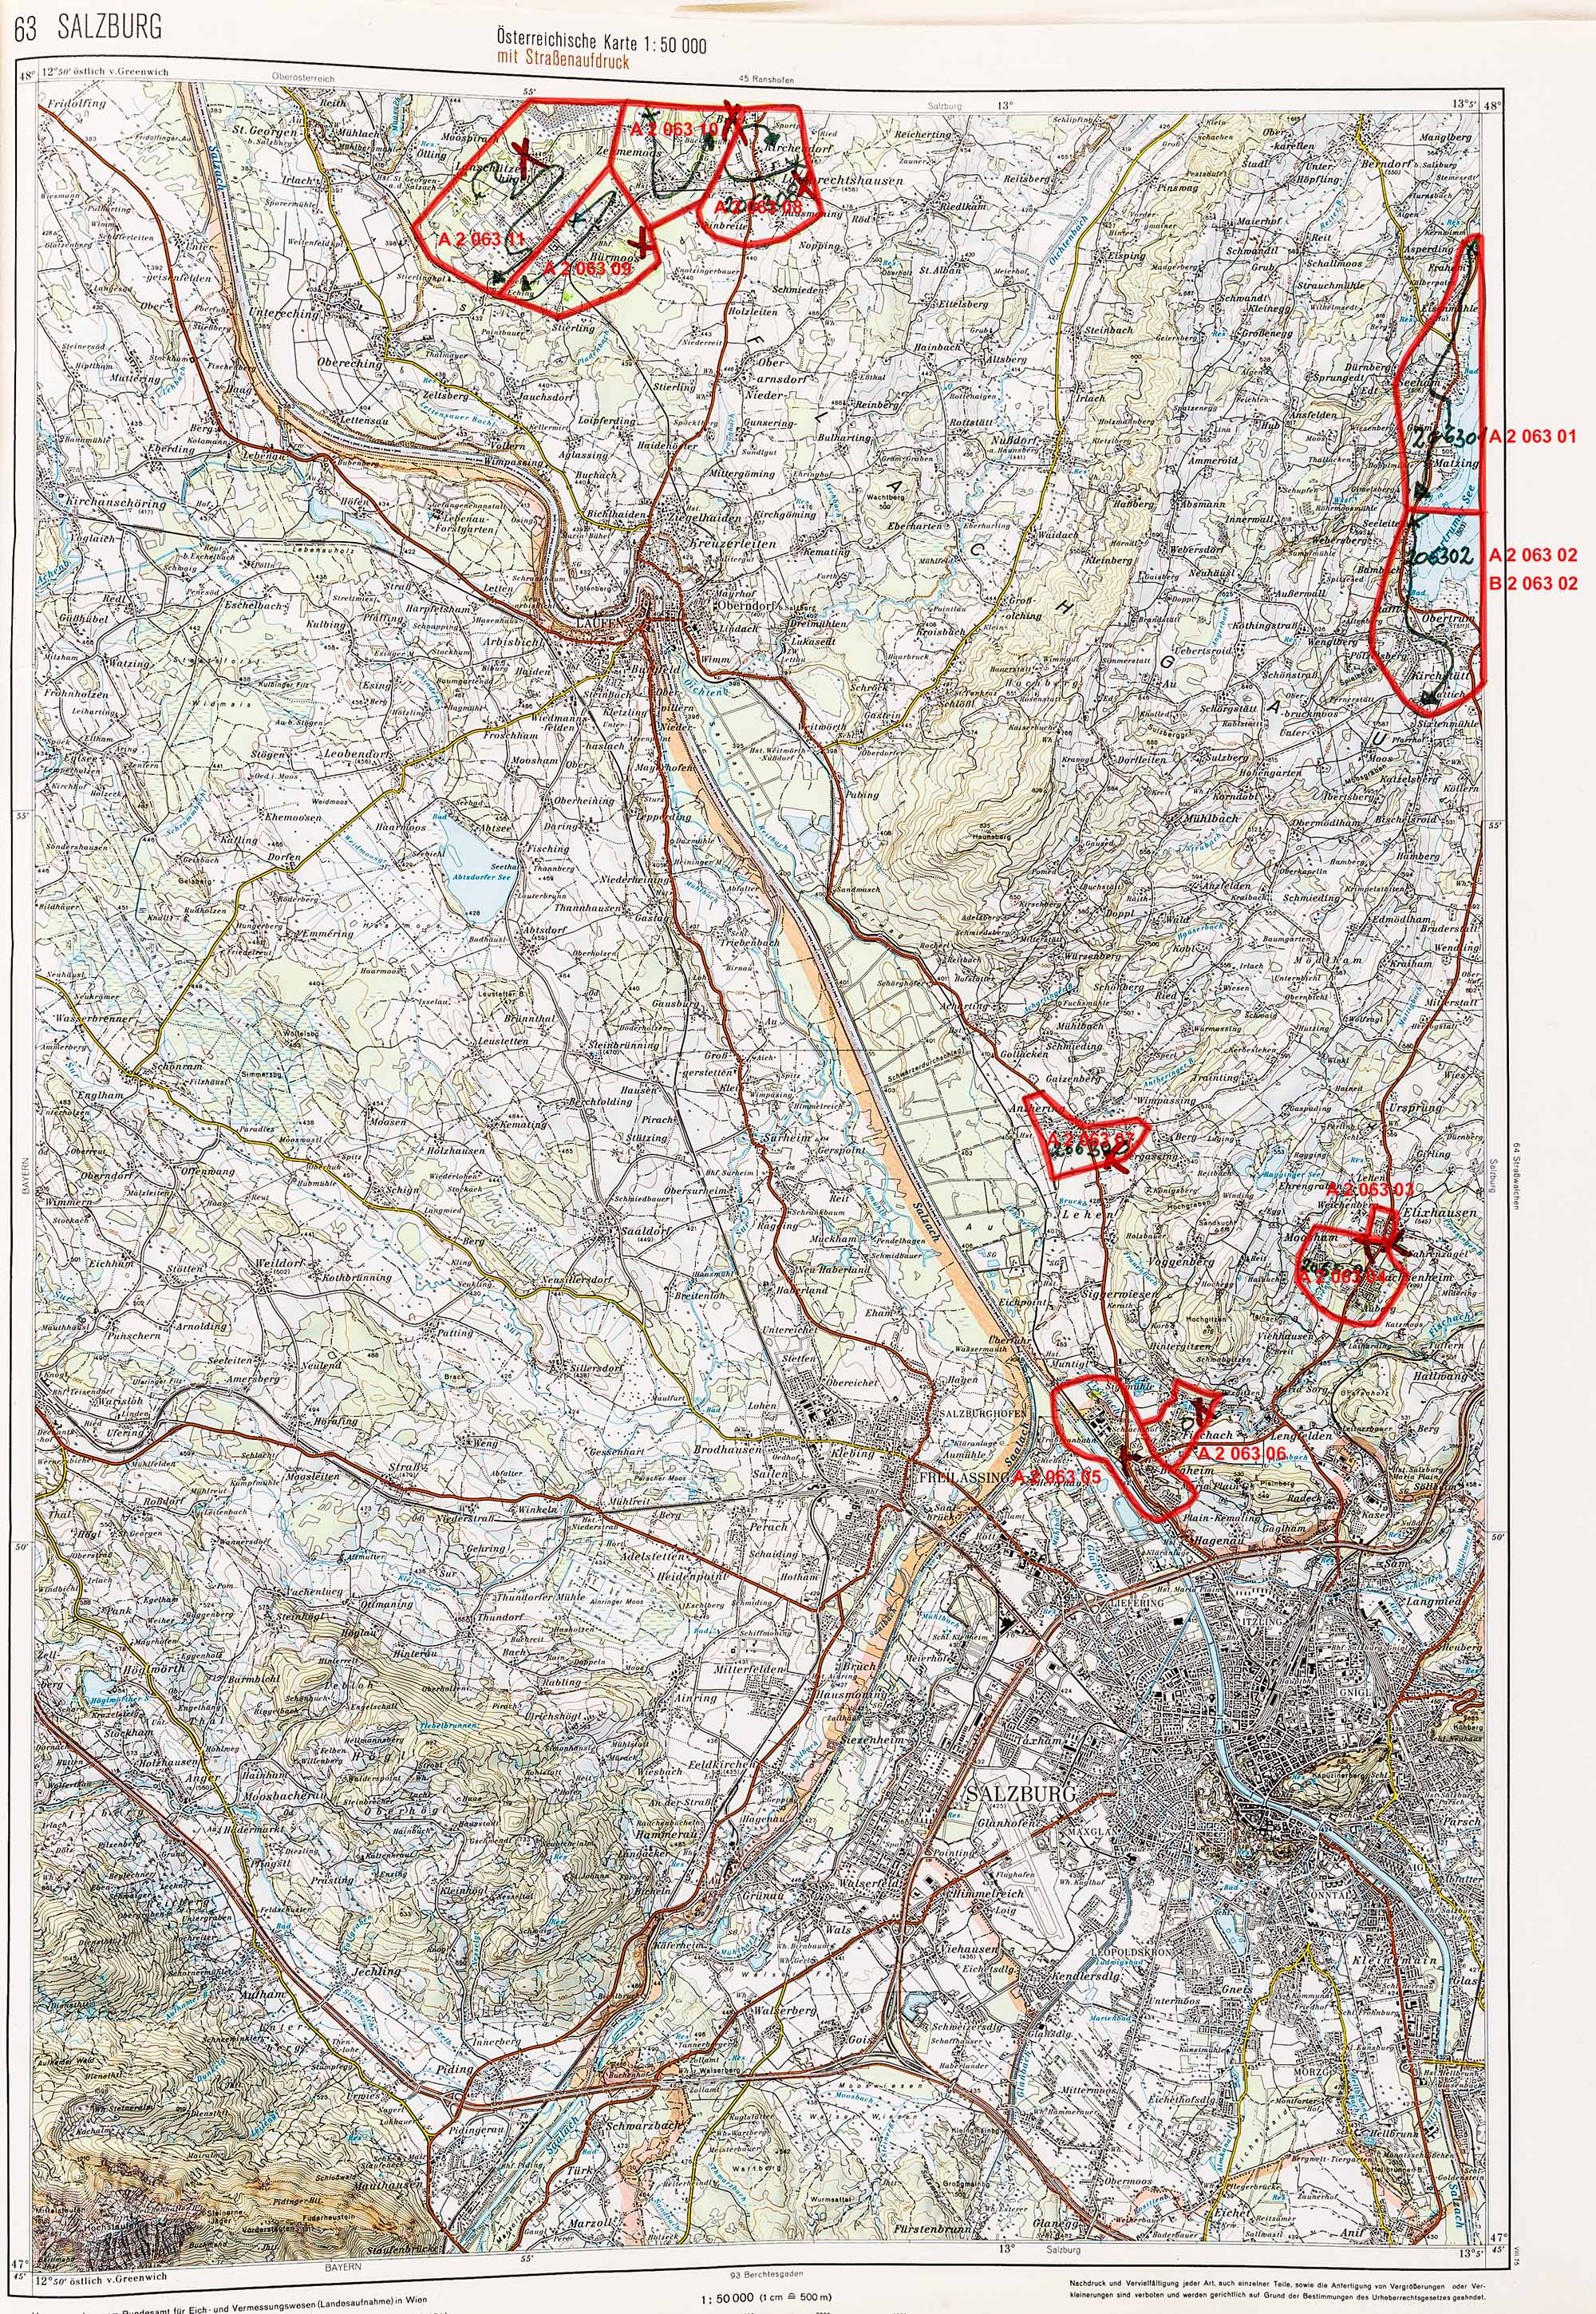 1979-1982 Karte 063